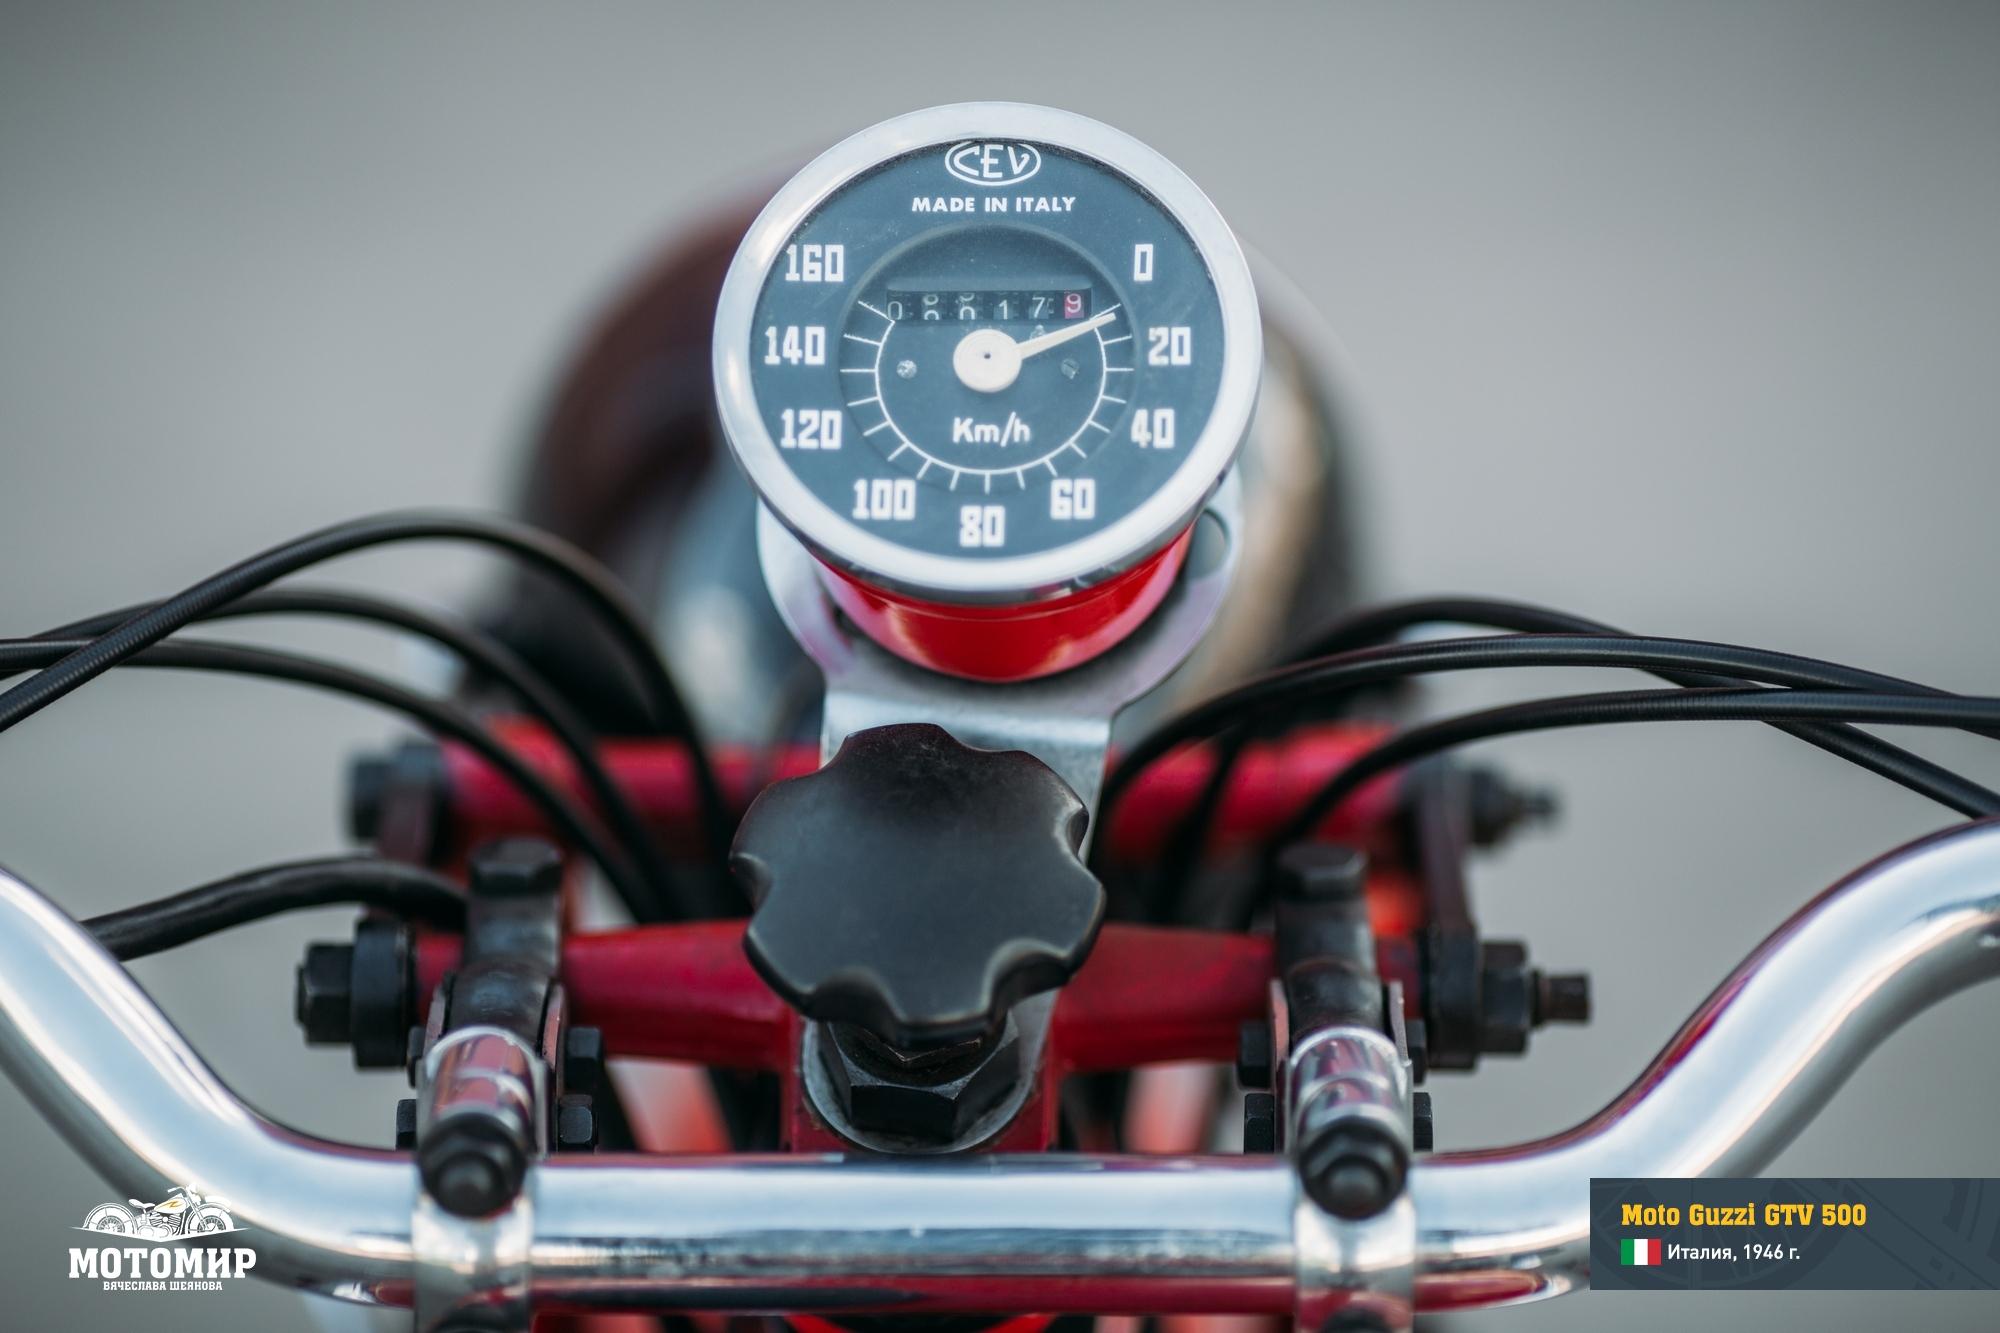 moto-guzzi-gtv-500-201509-web-20